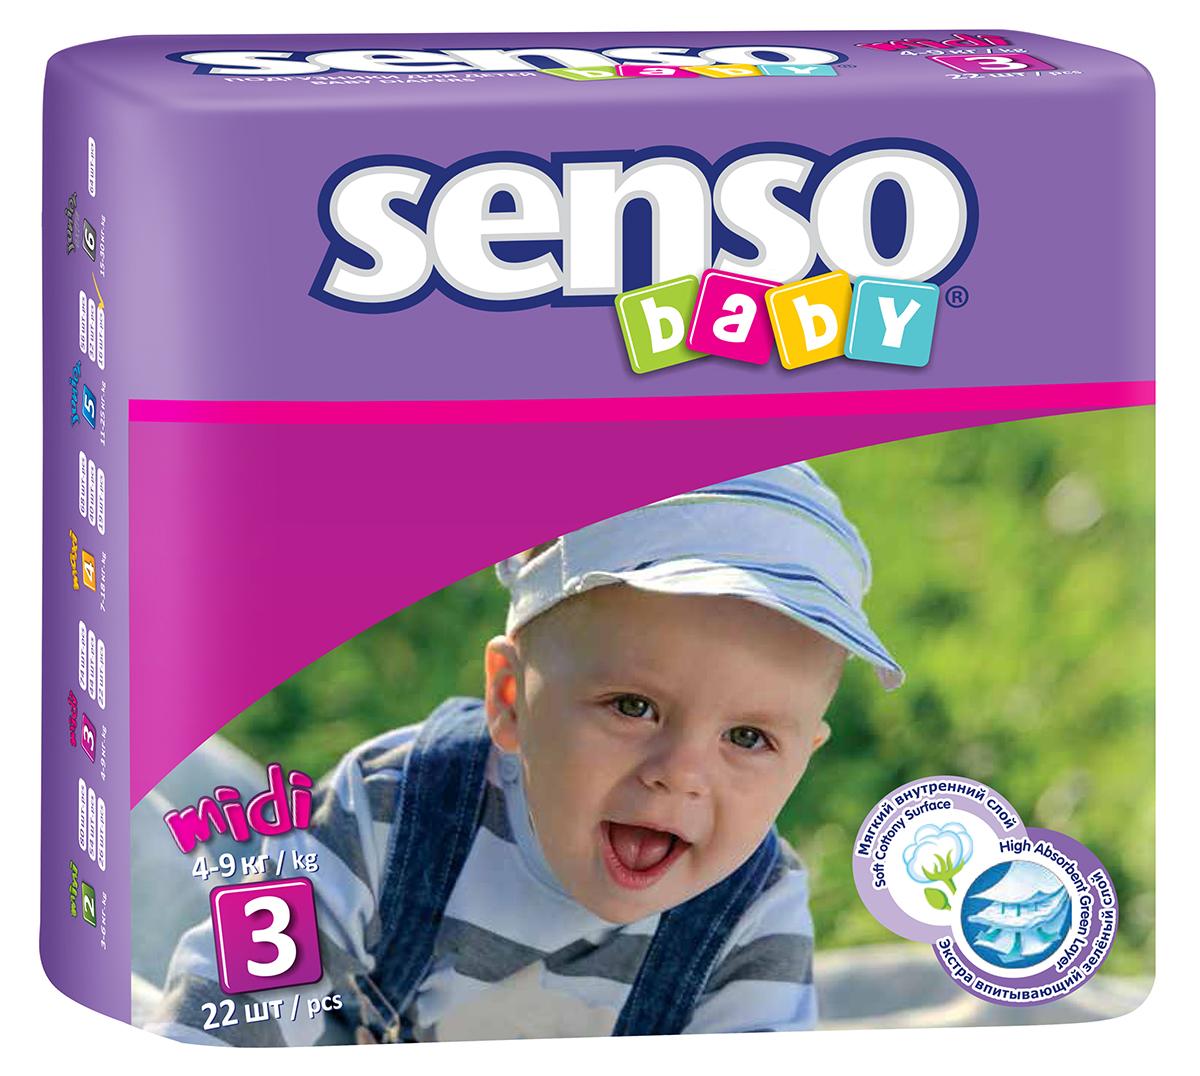 Senso Baby Подгузники детские Midi 4-9 кг 22 шт300022